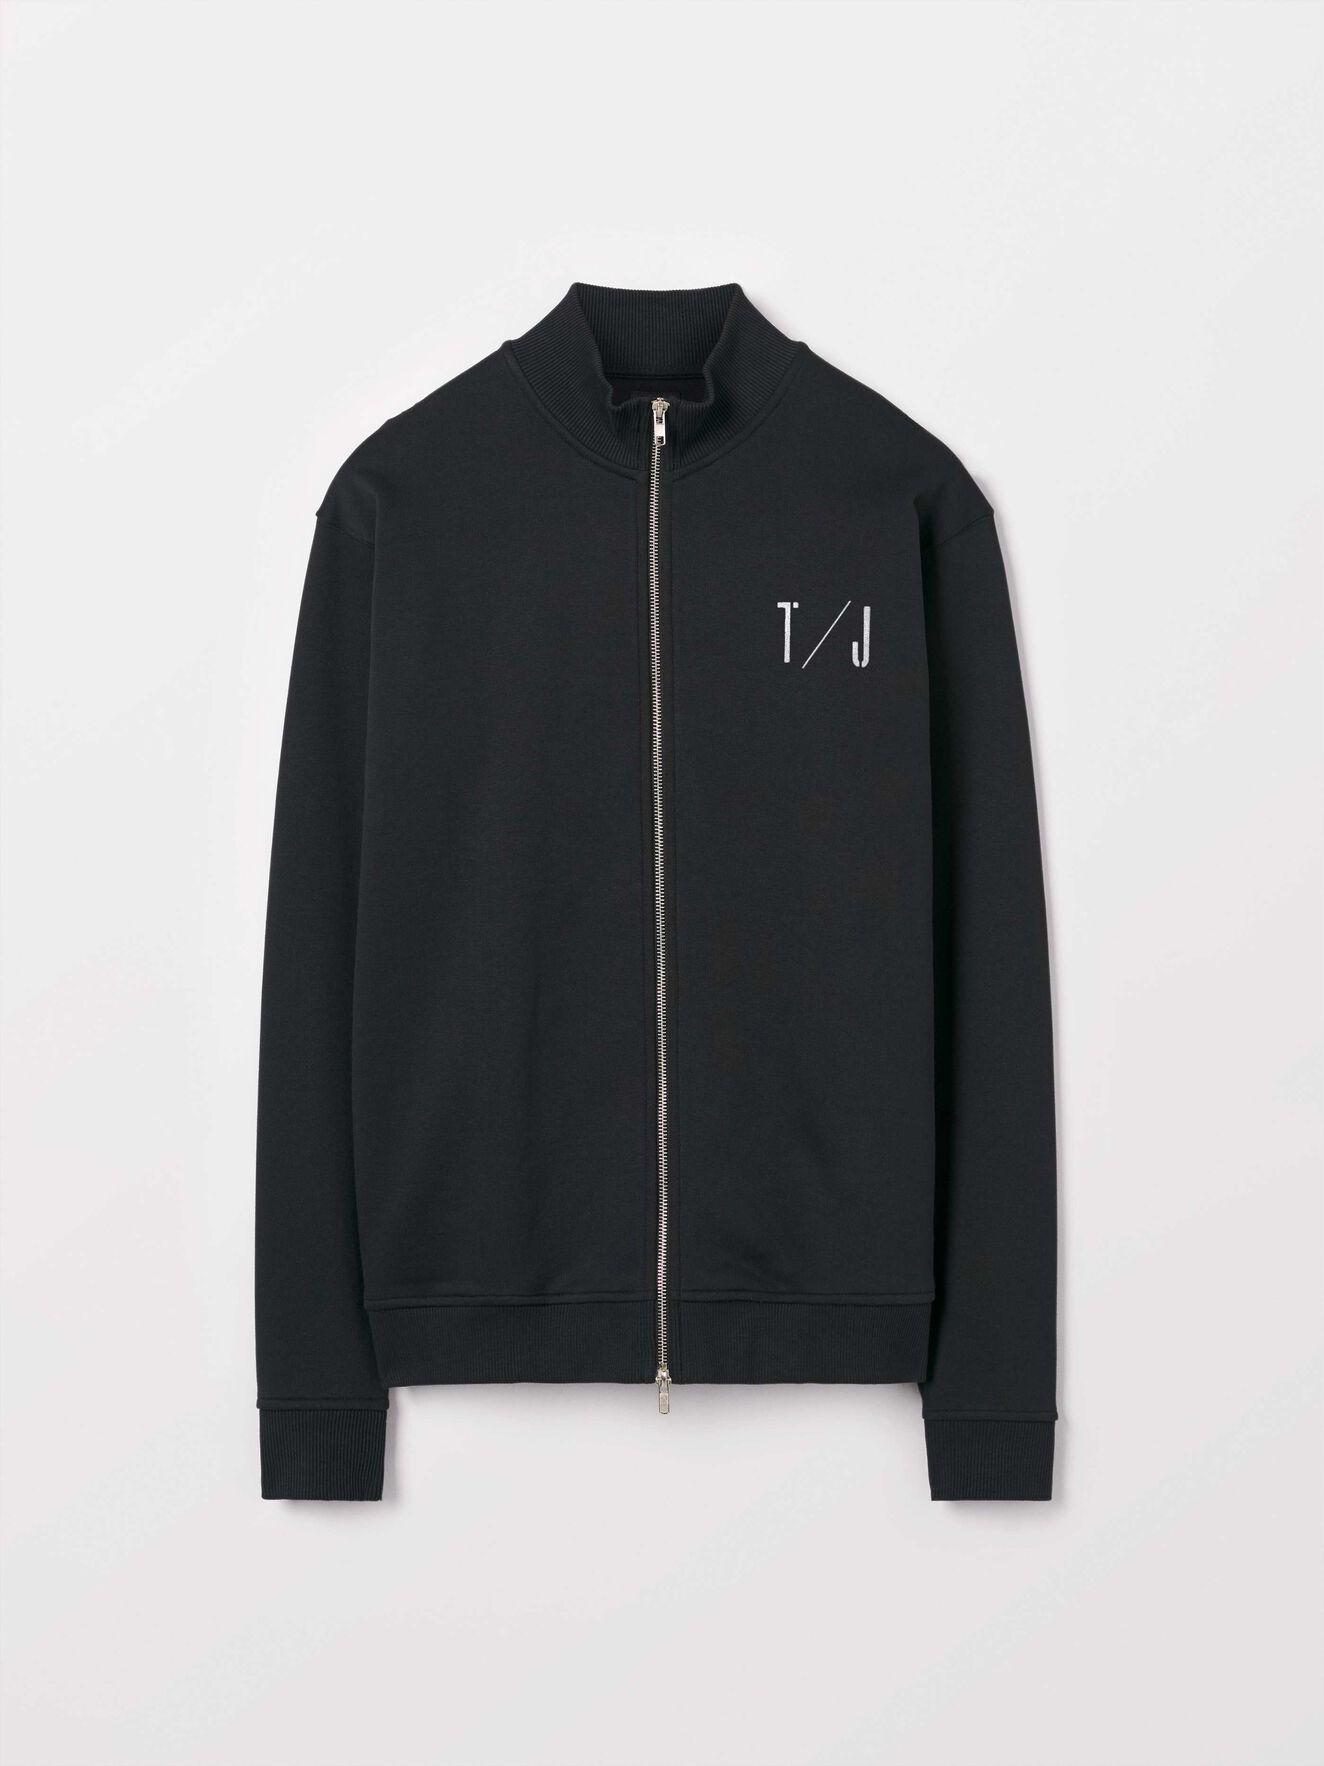 Pras Sweatshirt in Black from Tiger of Sweden